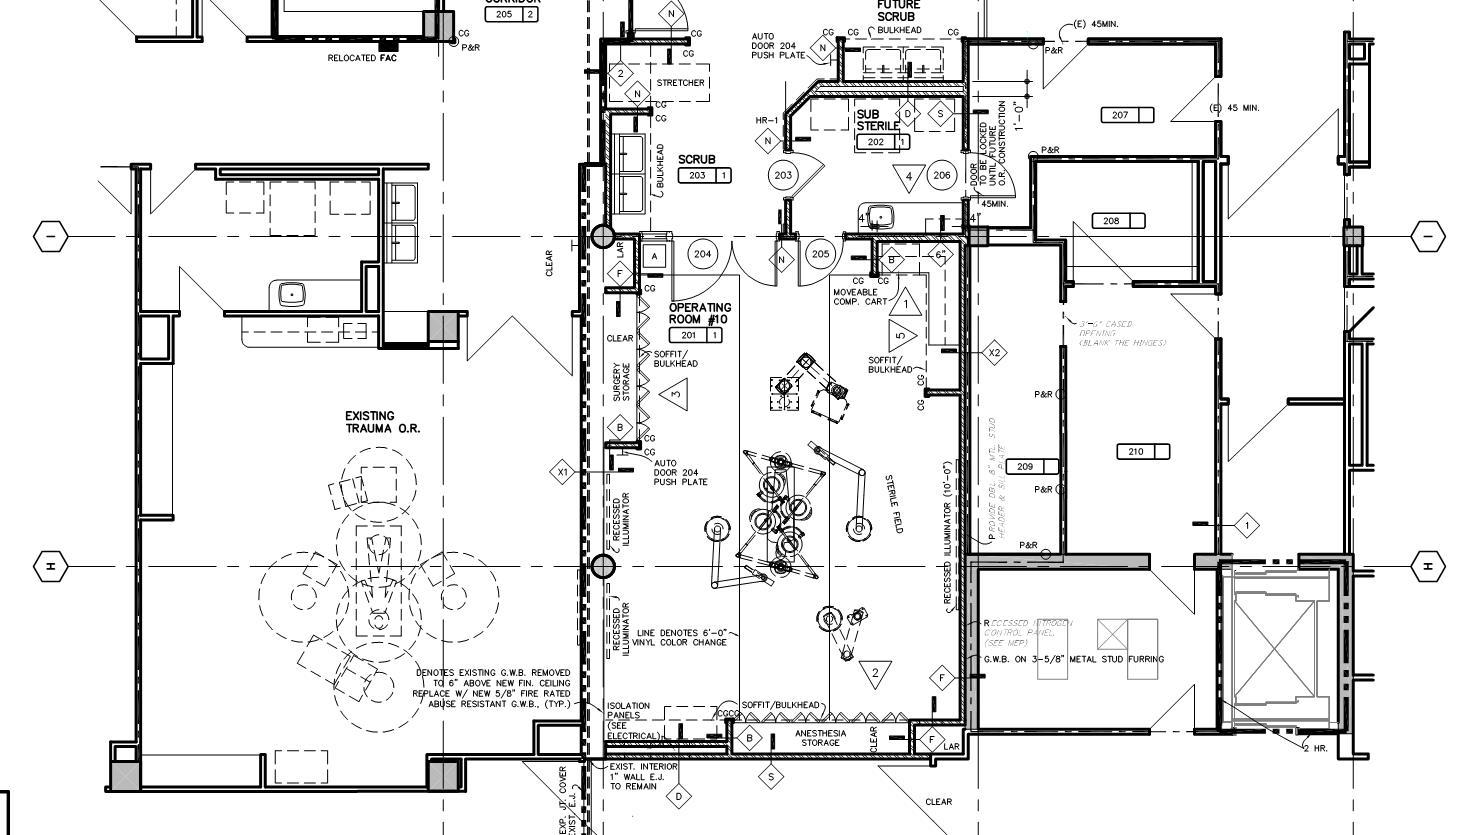 NEUROLOGICAL OPERATING ROOM #10 — Frandsen Architects